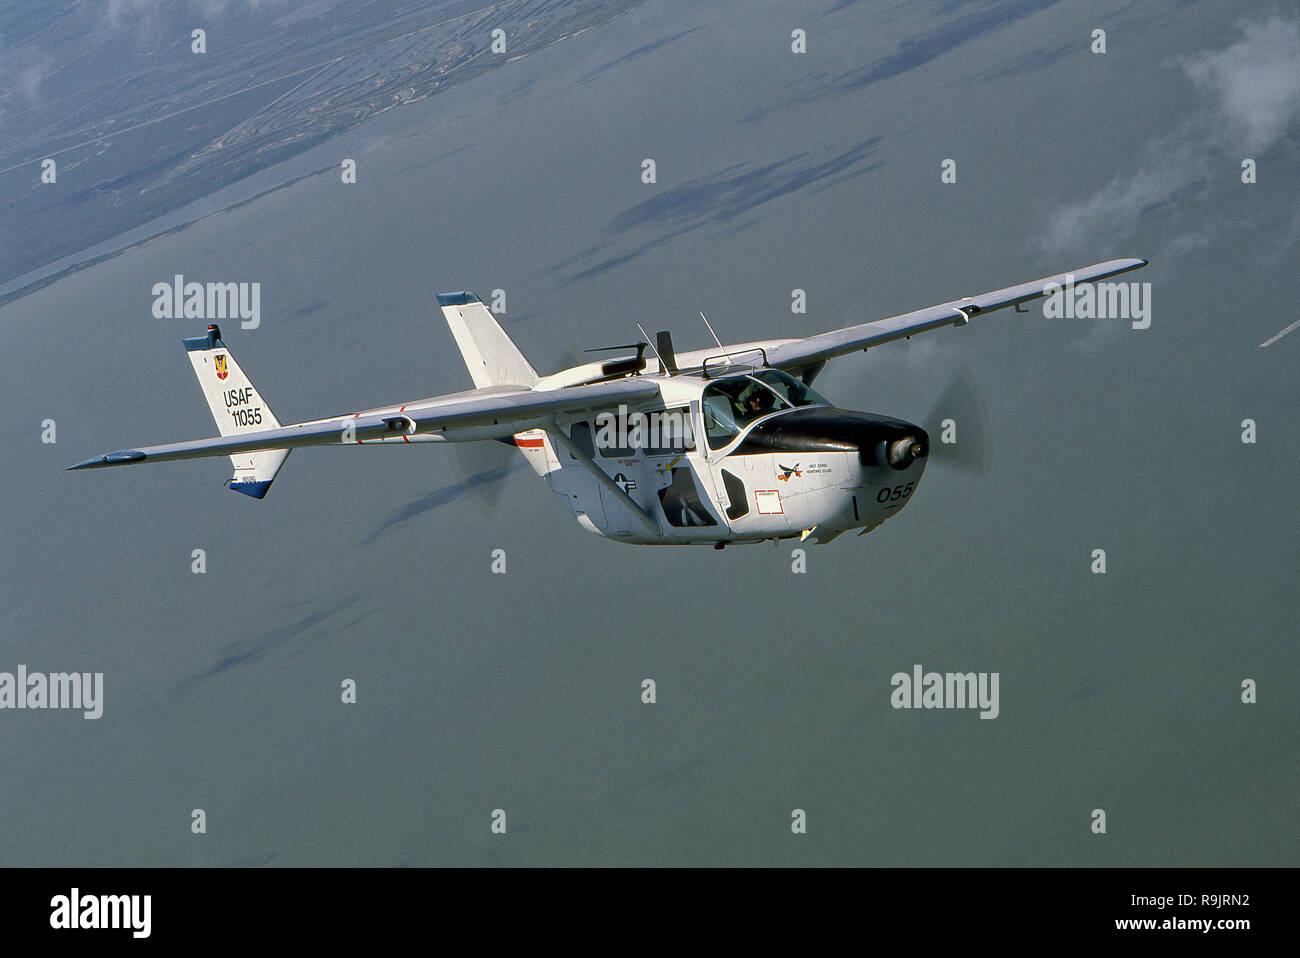 Vietnam Era Cessna O-2 Skymaster Airplane Stock Photo